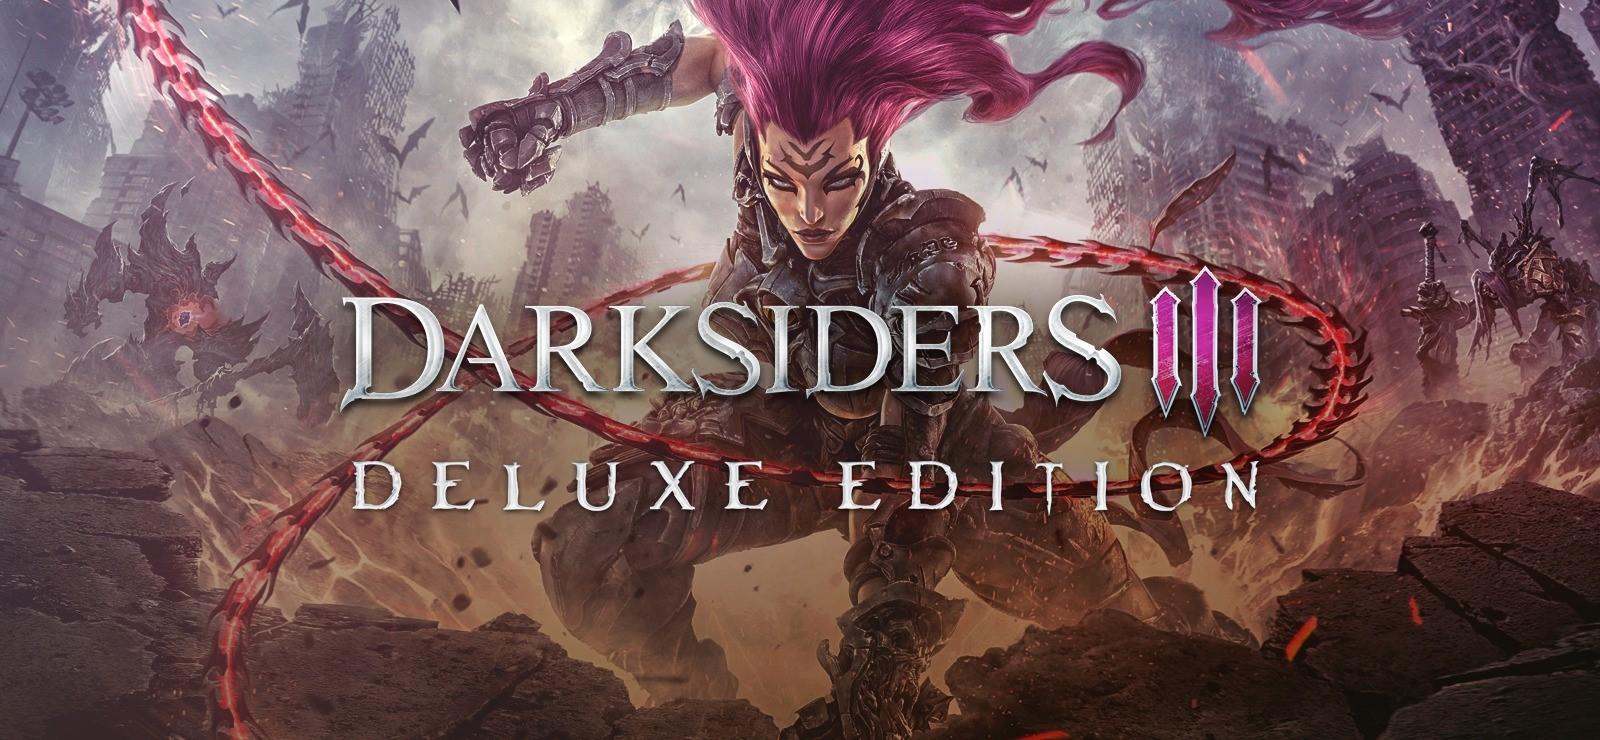 Darksiders III Deluxe Edition (Steam Gift RU)